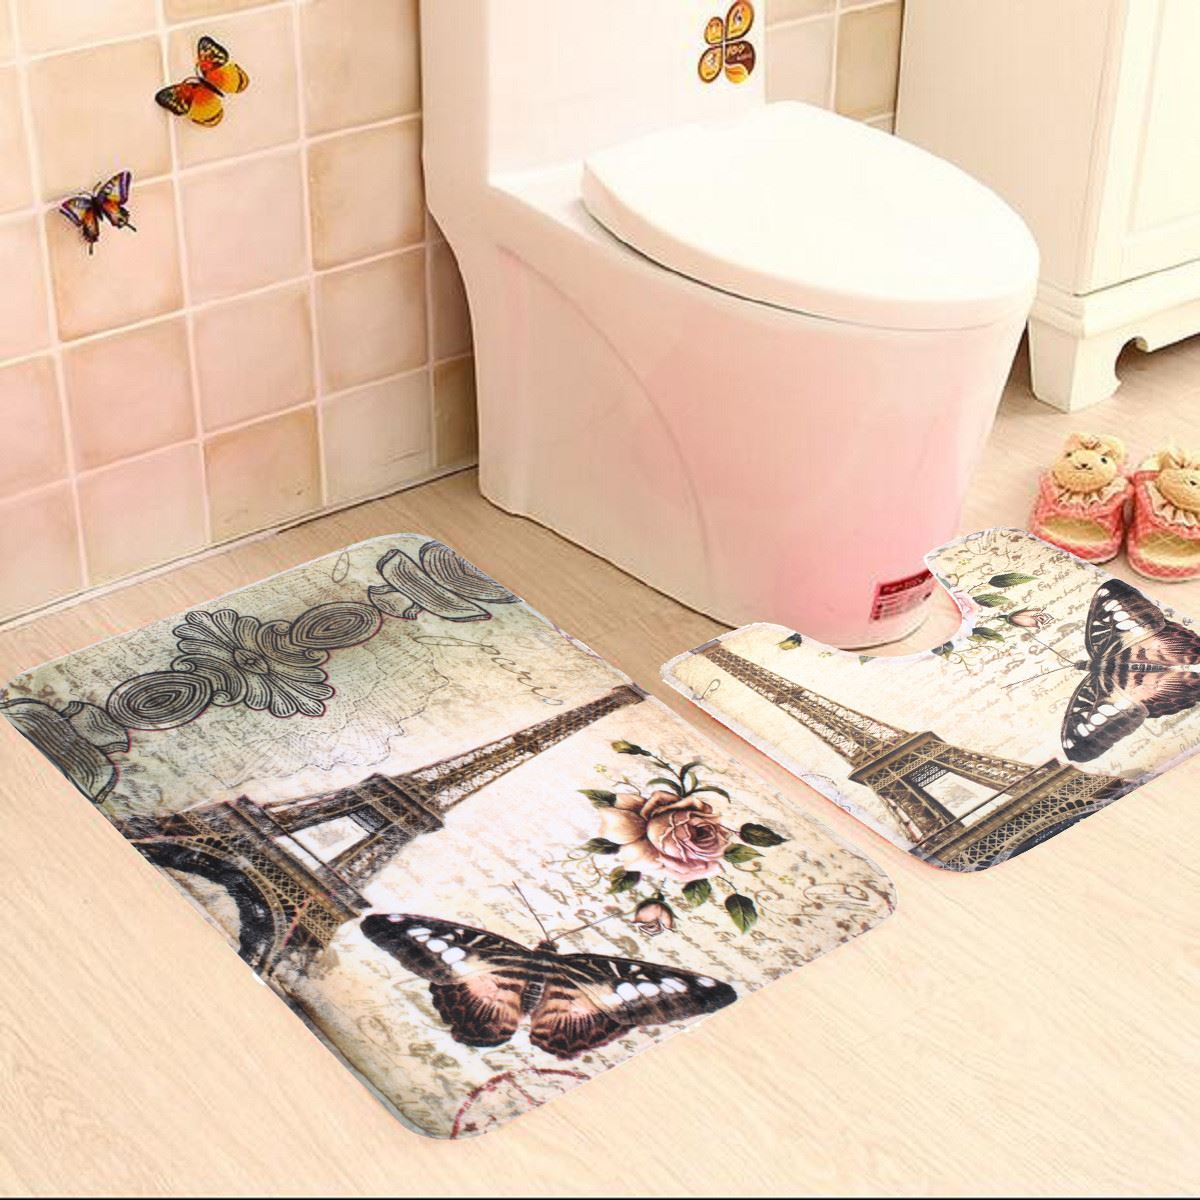 Bathroom carpet sets - Soft Paris Eiffel Tower Bath Pedestal Rug Cover Bathroom Bath Mat Set Household Bathroom Carpets Design